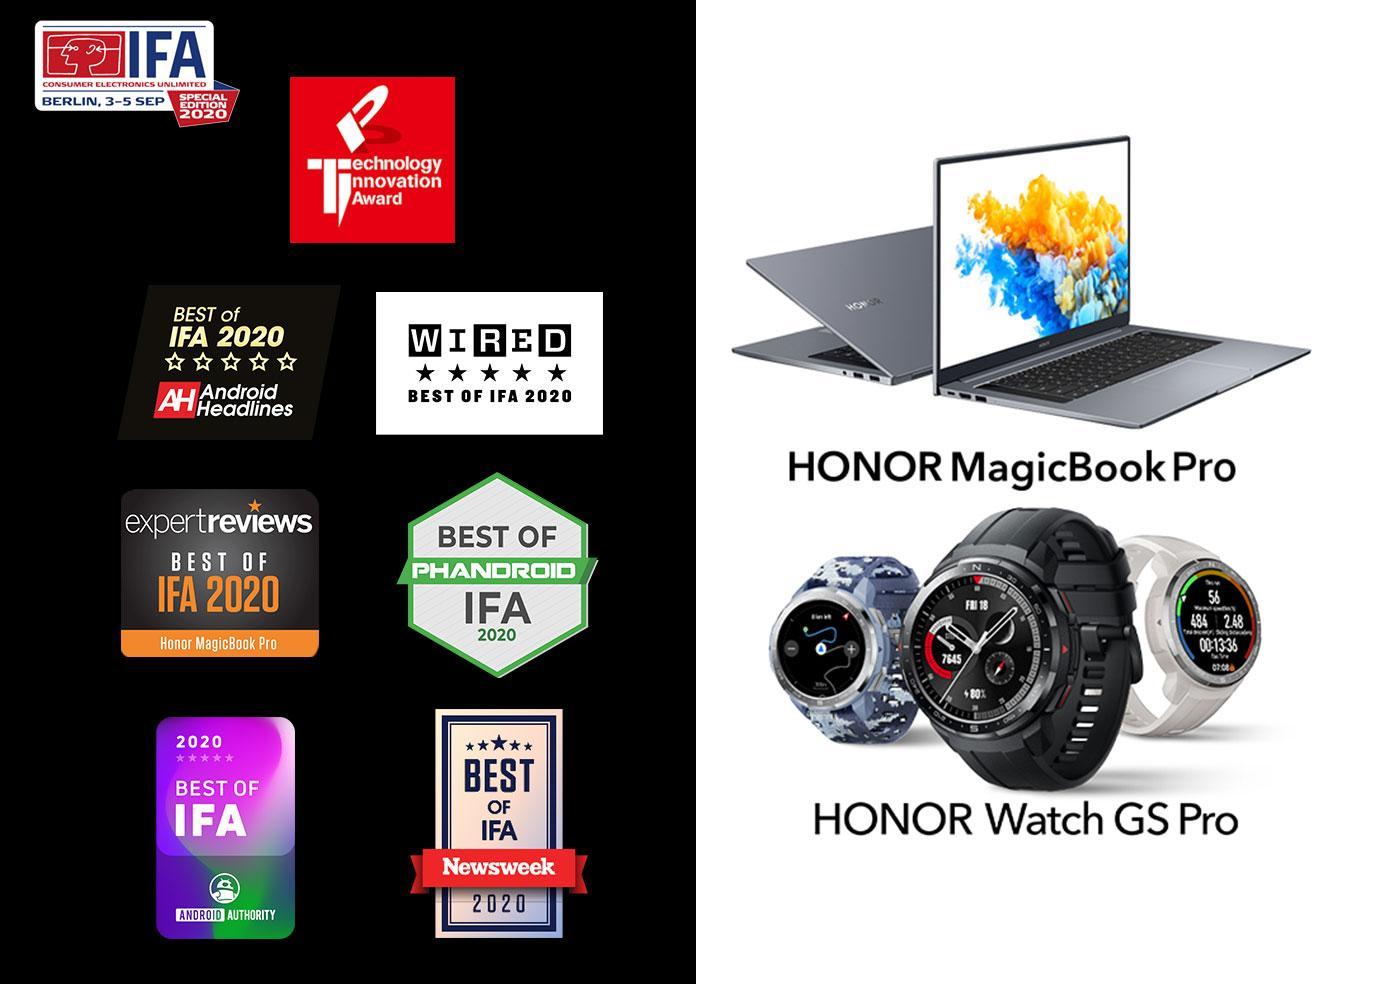 C:\Users\d84171079\Desktop\PR_1376x984_IFA_Awards.jpg